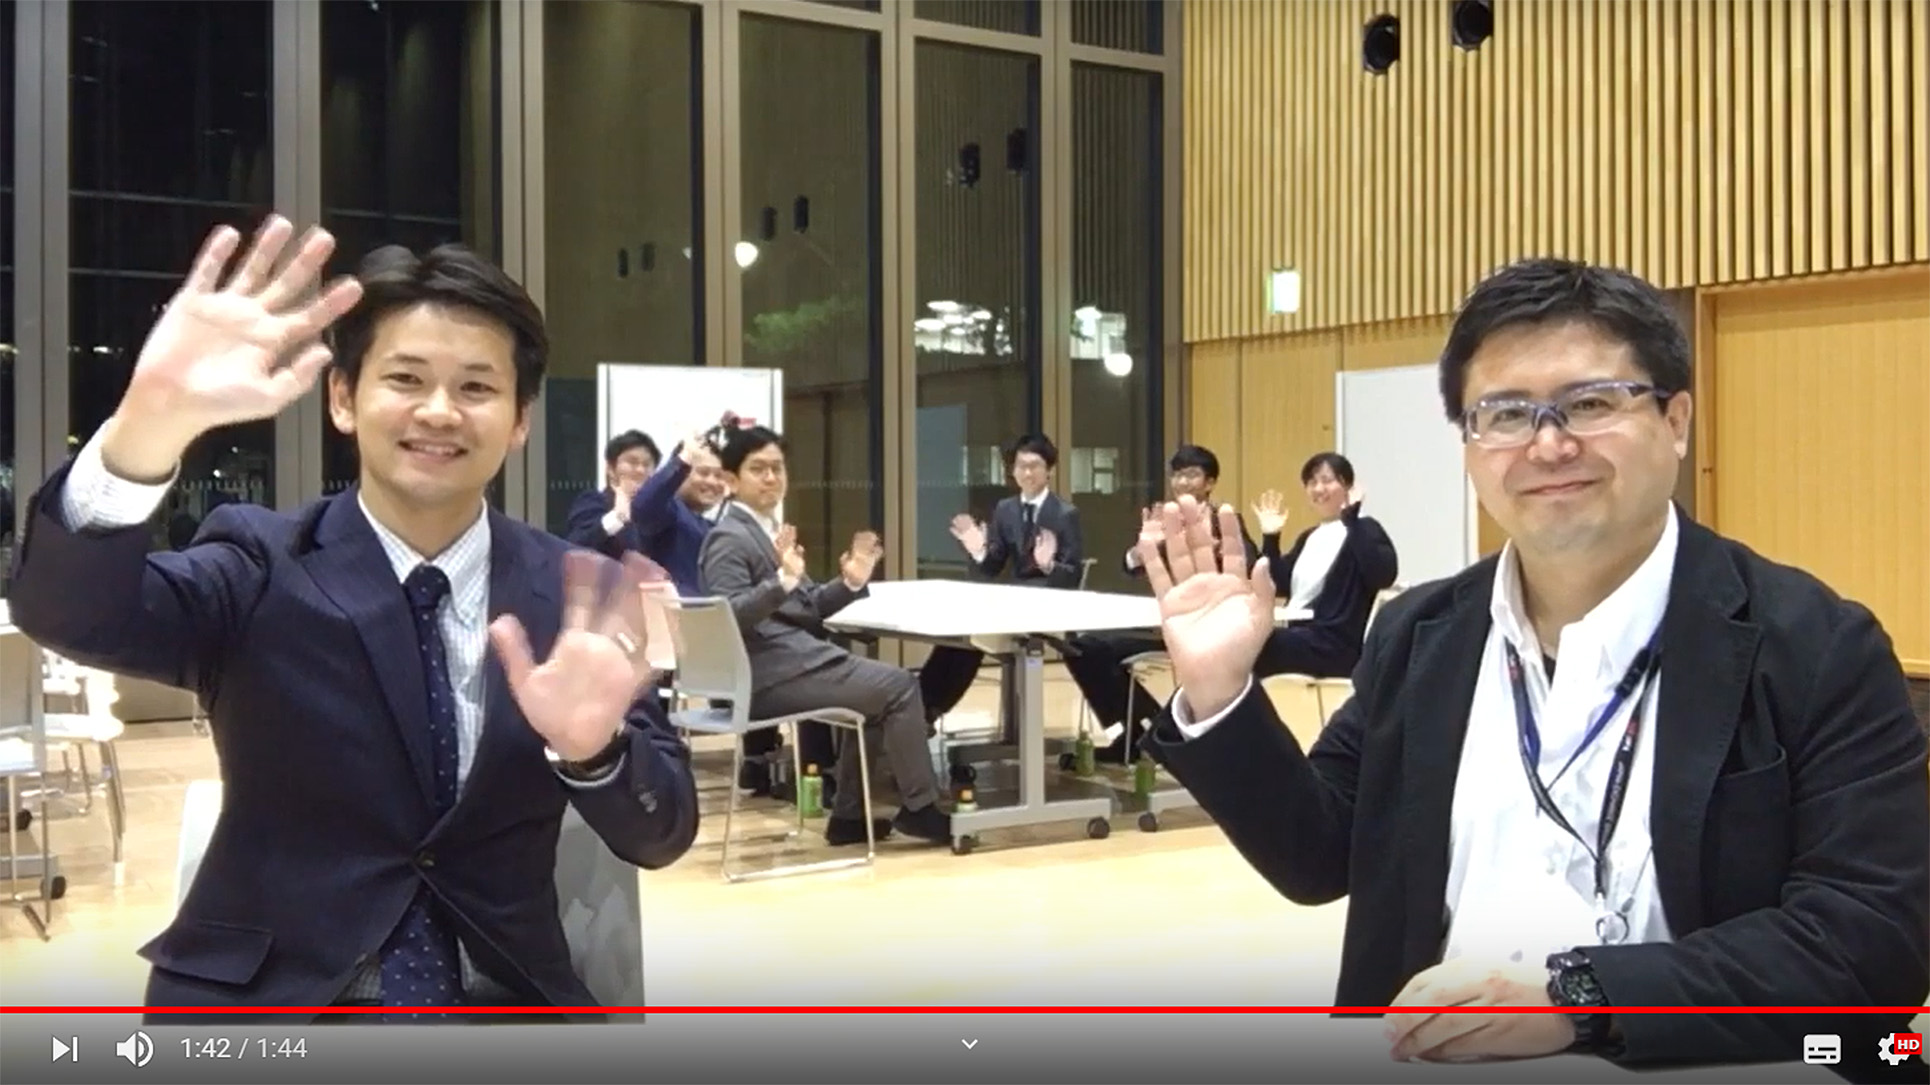 dokkyo-news.com ライブニュース:若手座談会収録中!